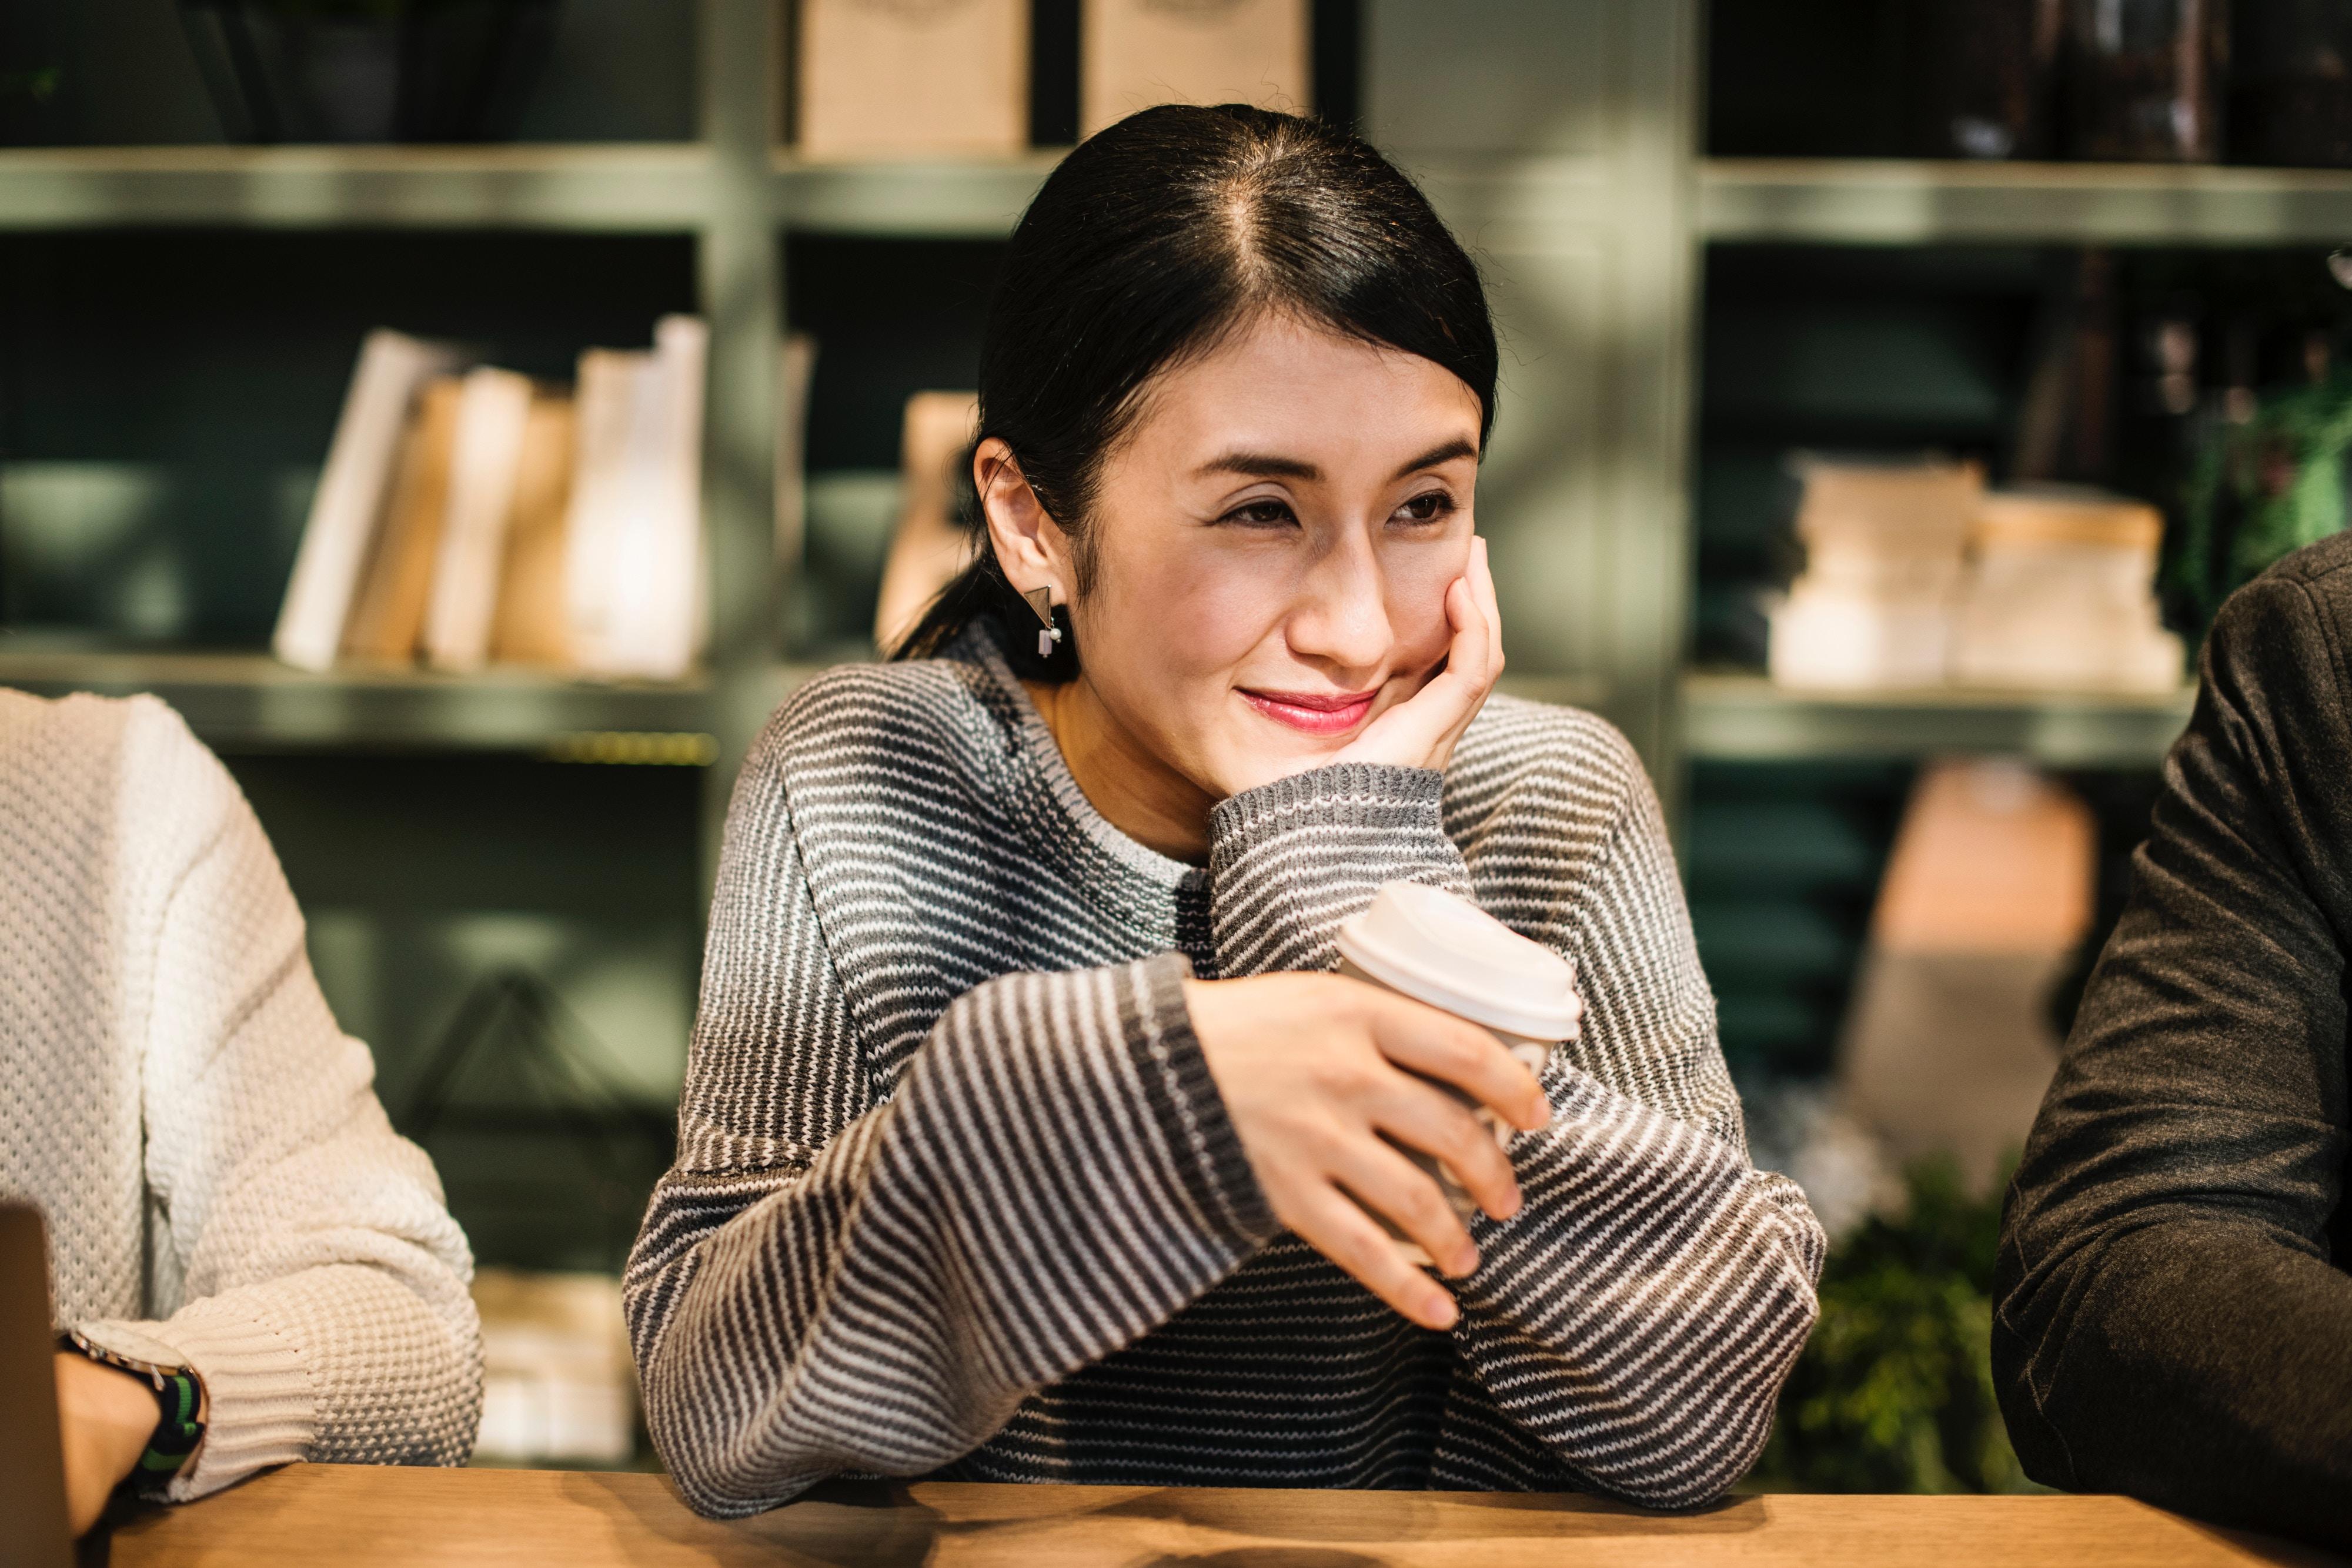 does CBD coffee have health benefits?